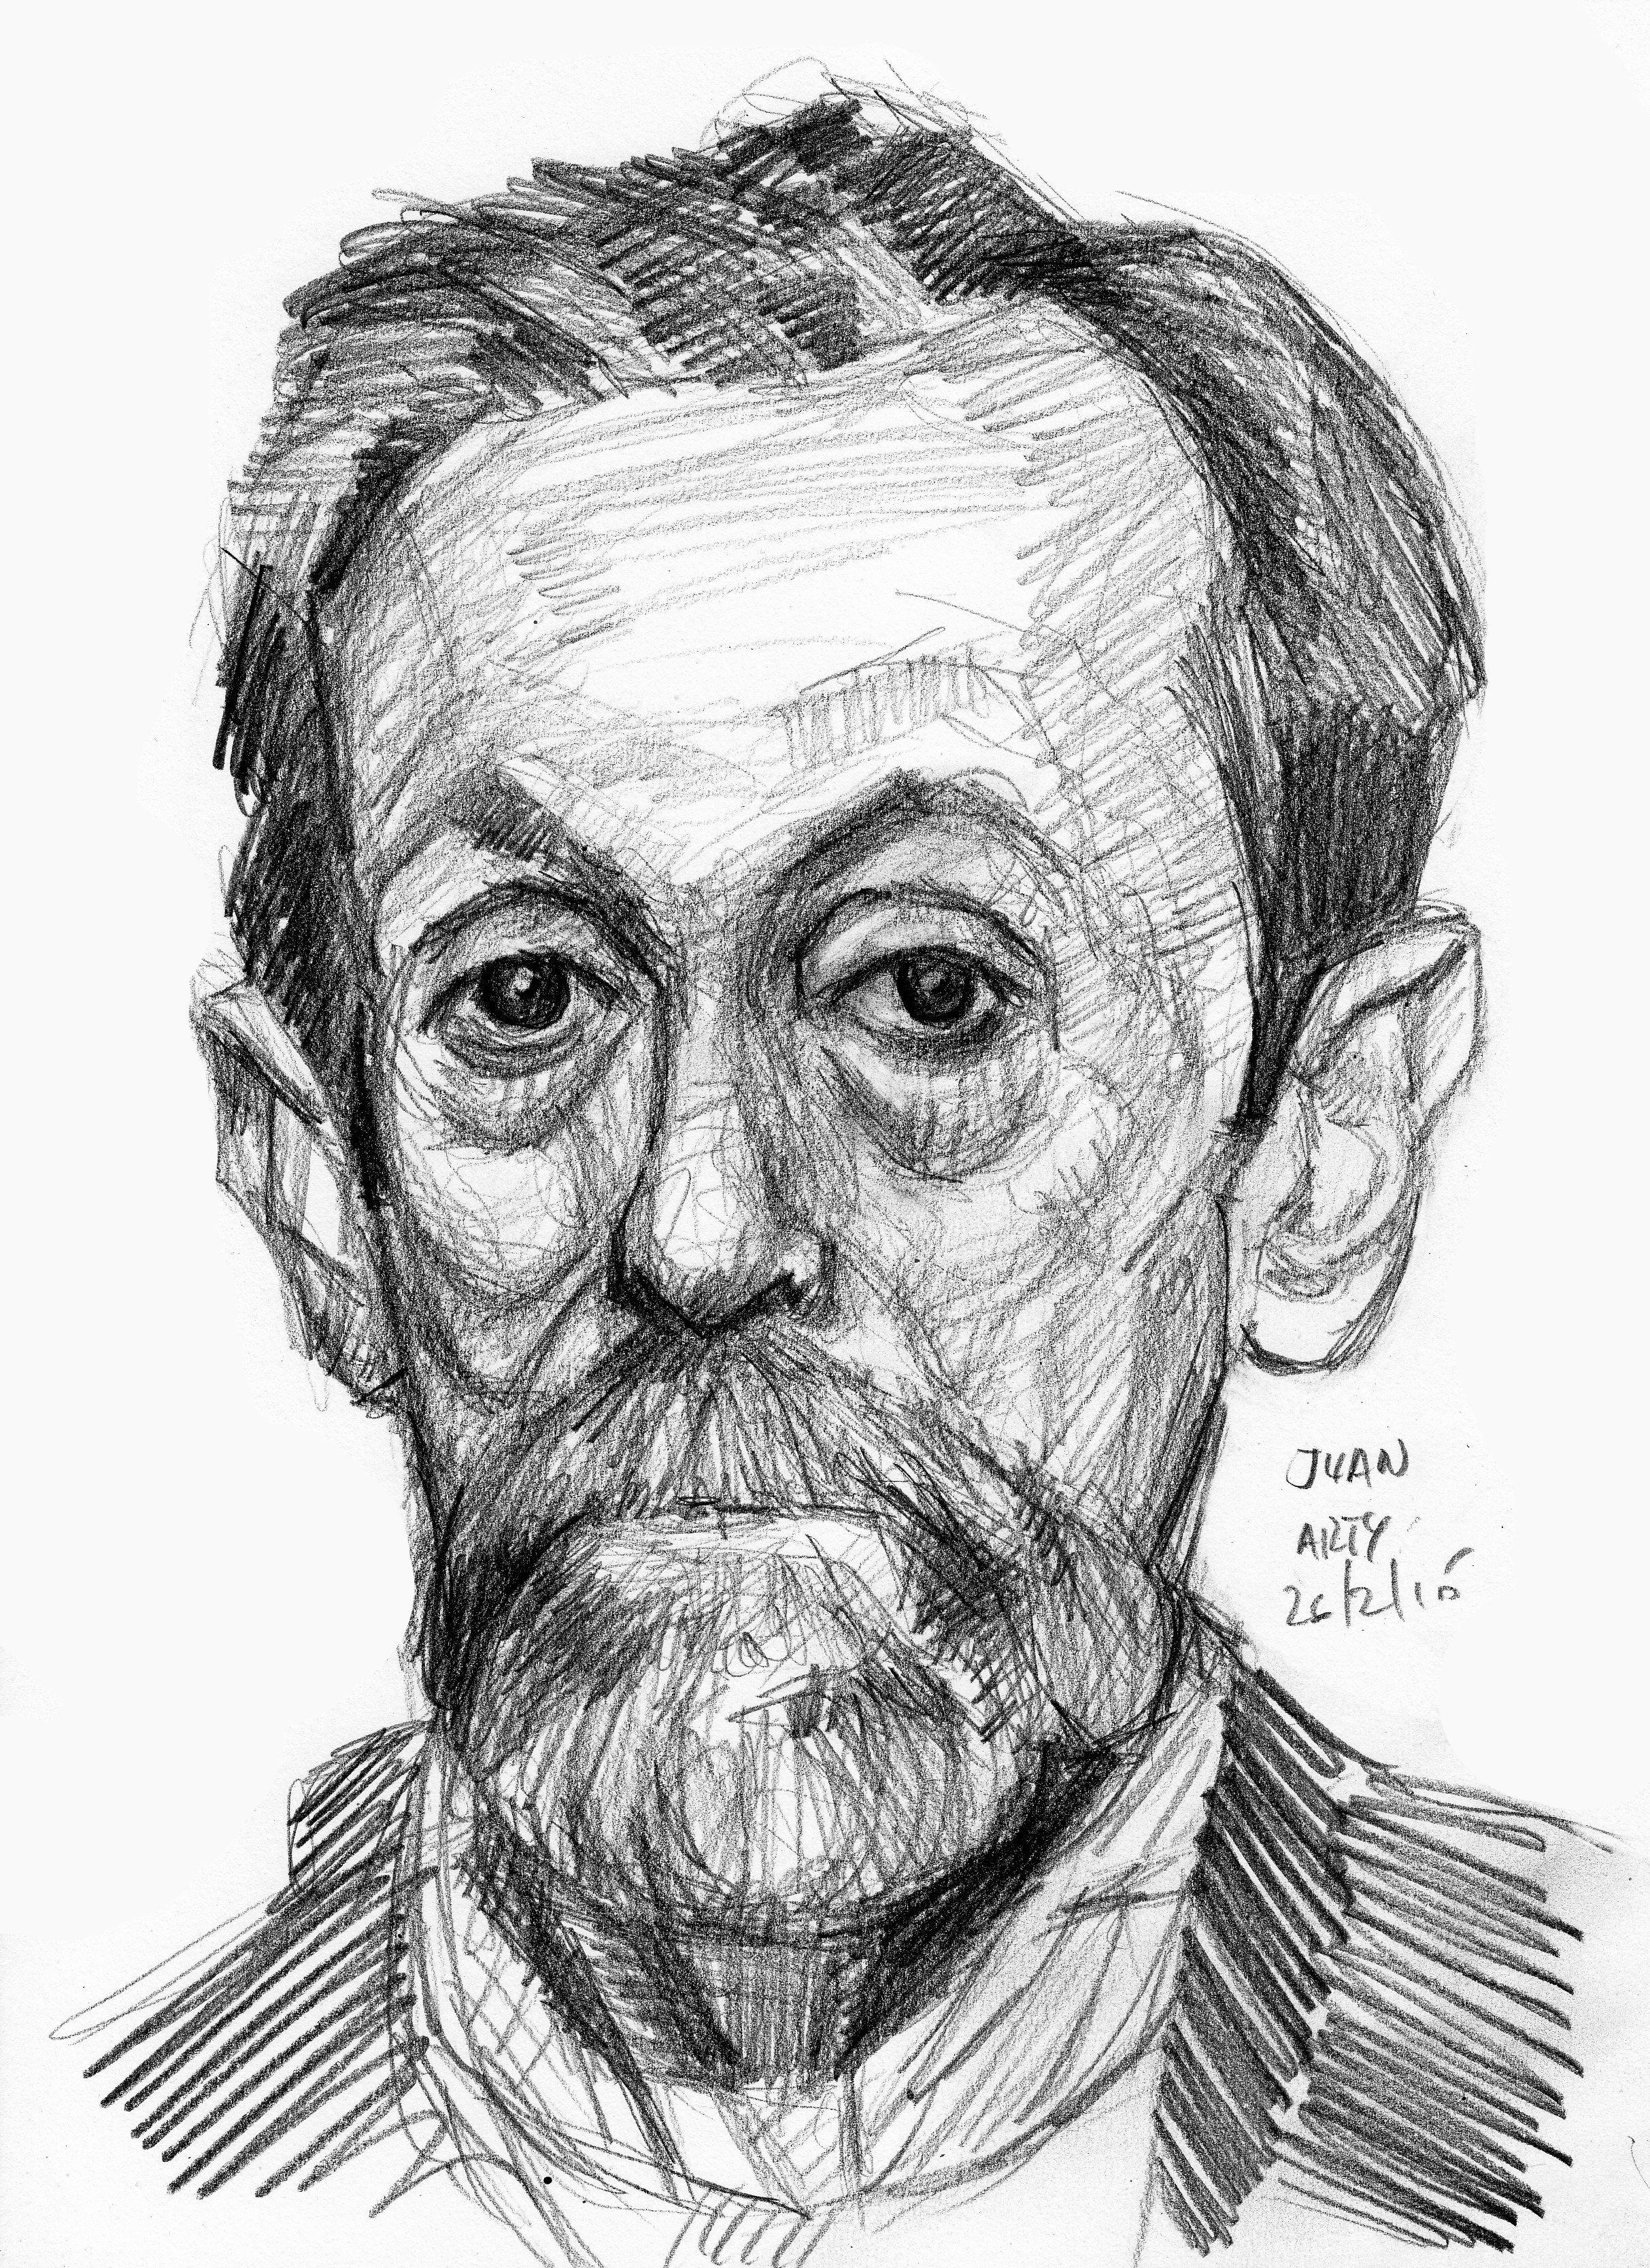 Juan pencil 4b drawing lessons painting art dots pencil human head